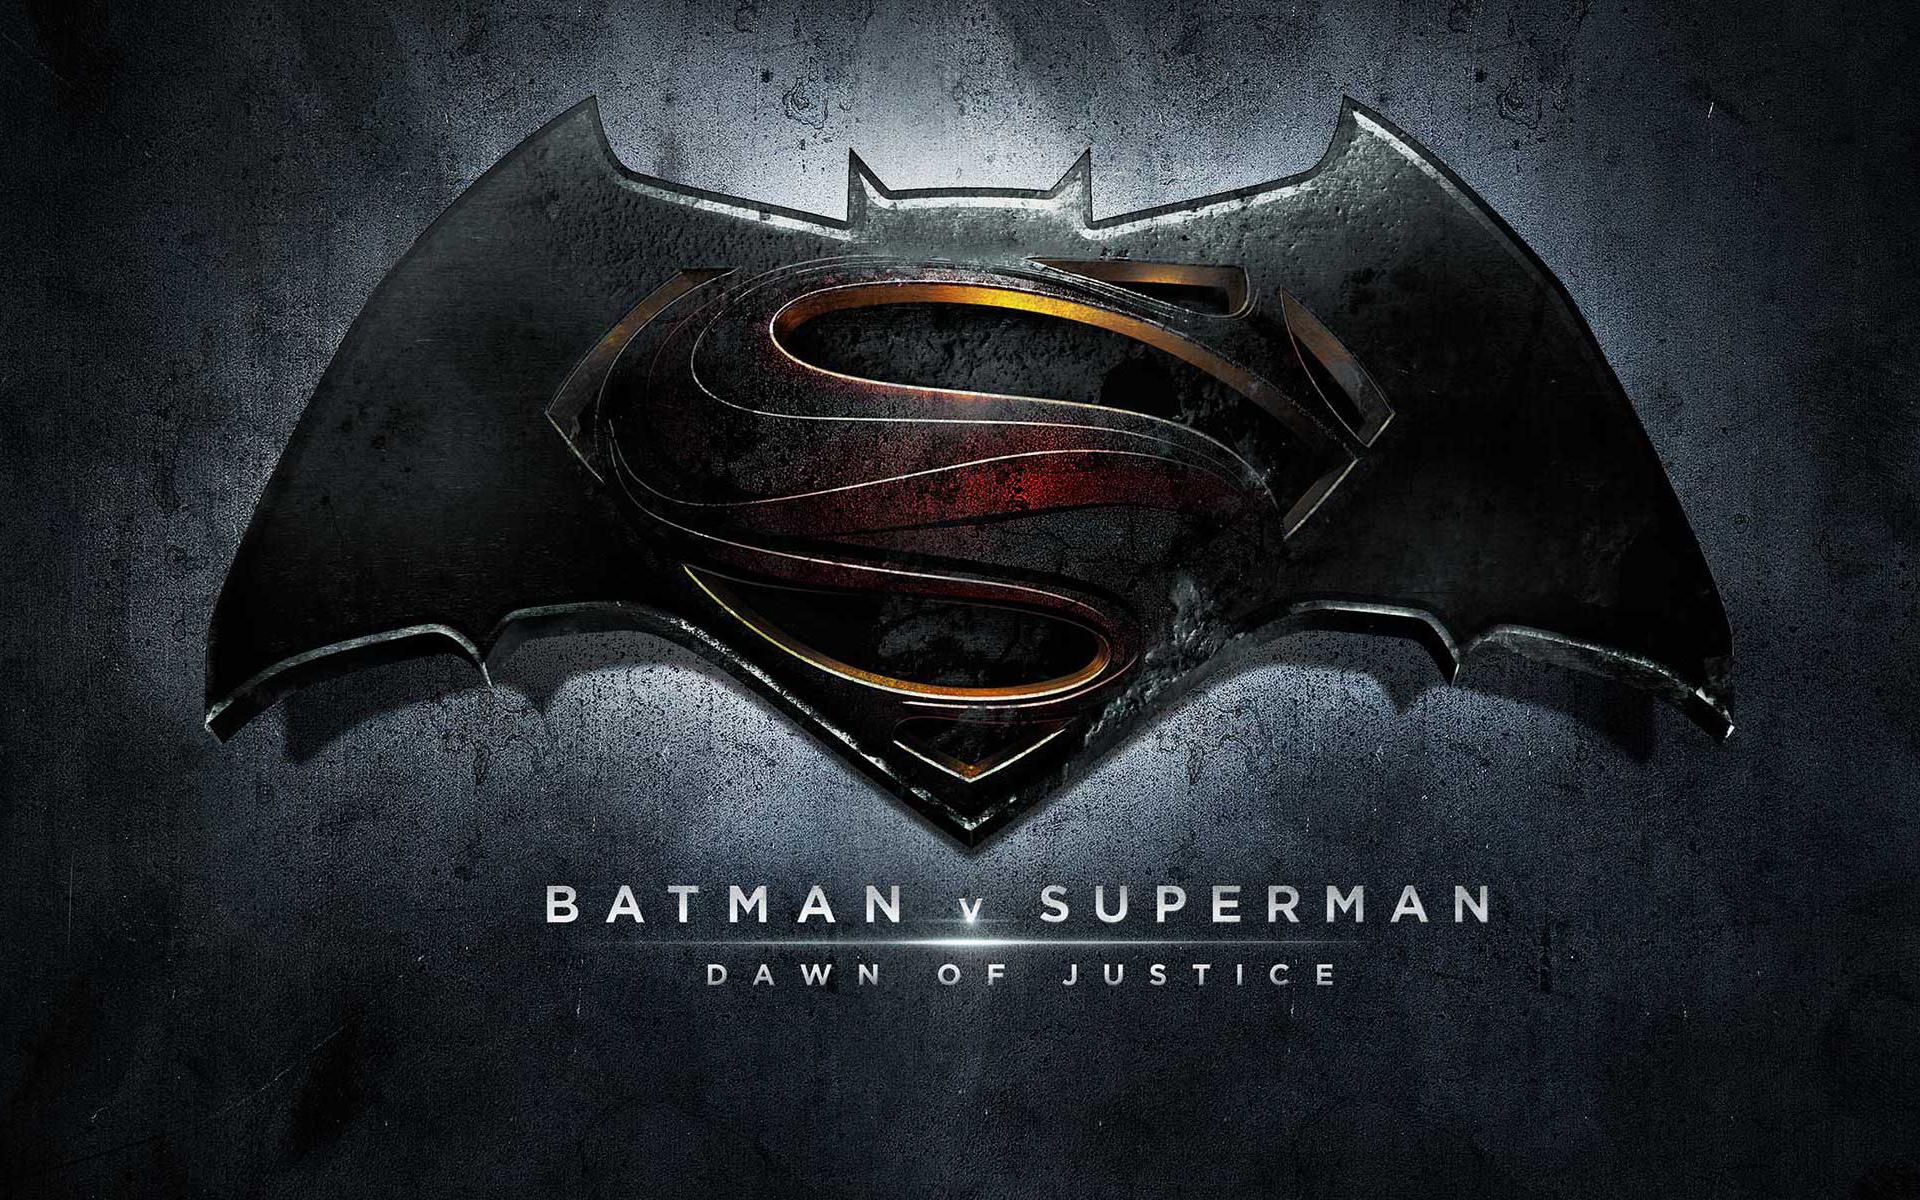 Batman vs Superman Dawn of Justice Logo Exclusive HD Wallpapers 6669 1920x1200